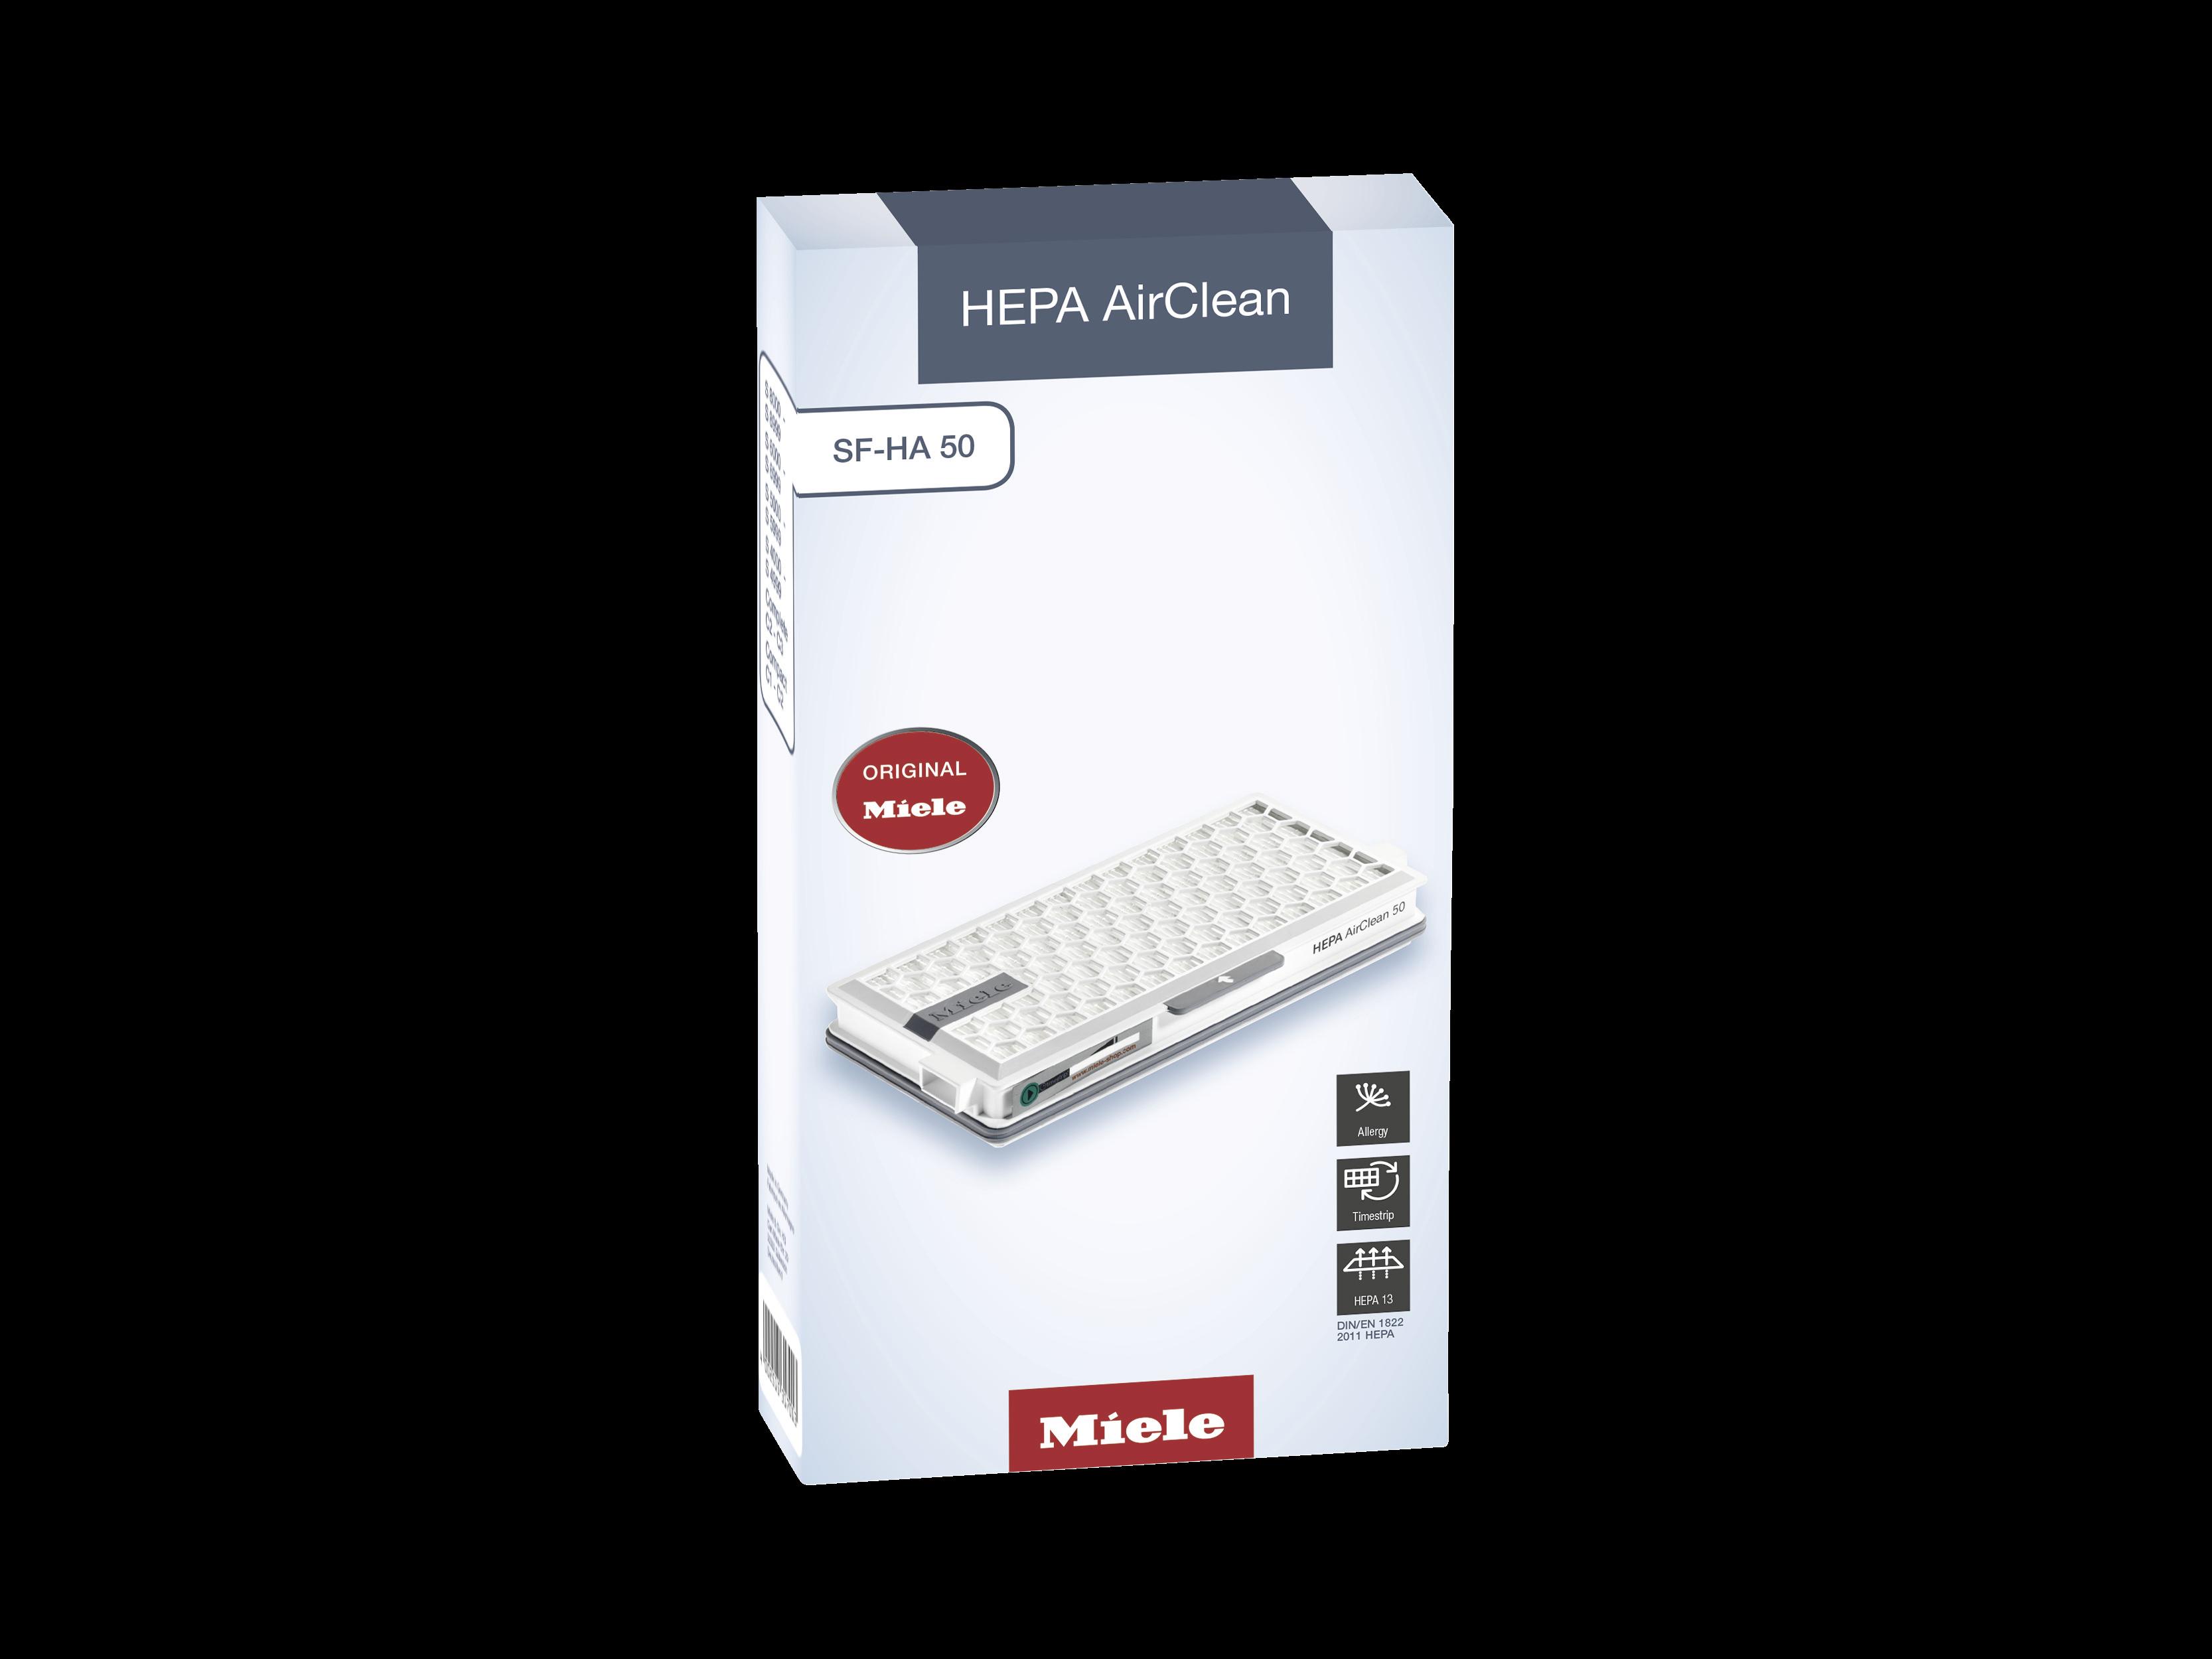 1PC Durable Filter For Miele SF-HA 50 Hepa Airclean Vacuum Cleaner Accessories